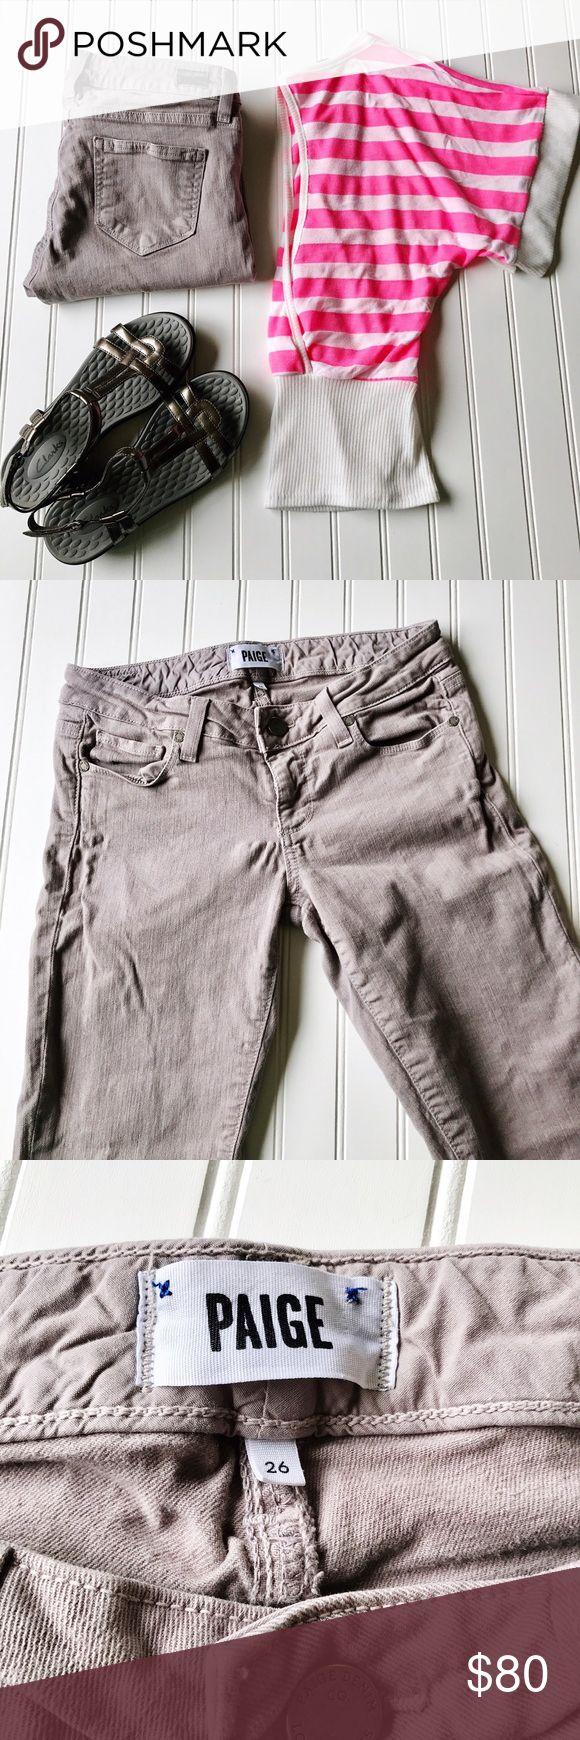 "Paige Jeans Grey Skinny Jeans Paige Jeans Grey Skinny Jeans  Waist 28"" Inseam 28""  Sizing:  •26=2 Paige Jeans Jeans Skinny"